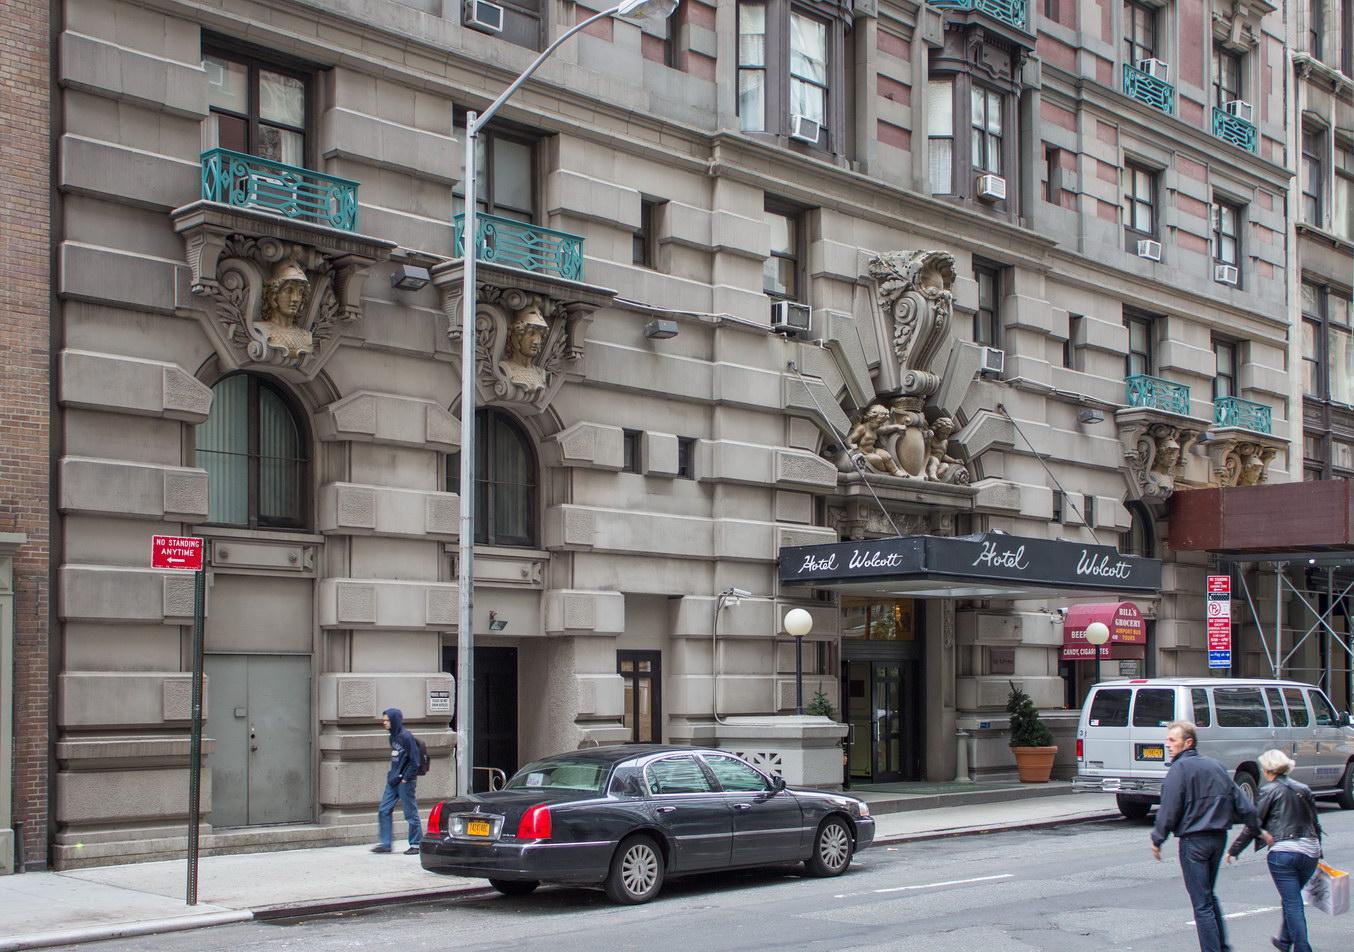 new york architecture photos hotel wolcott. Black Bedroom Furniture Sets. Home Design Ideas